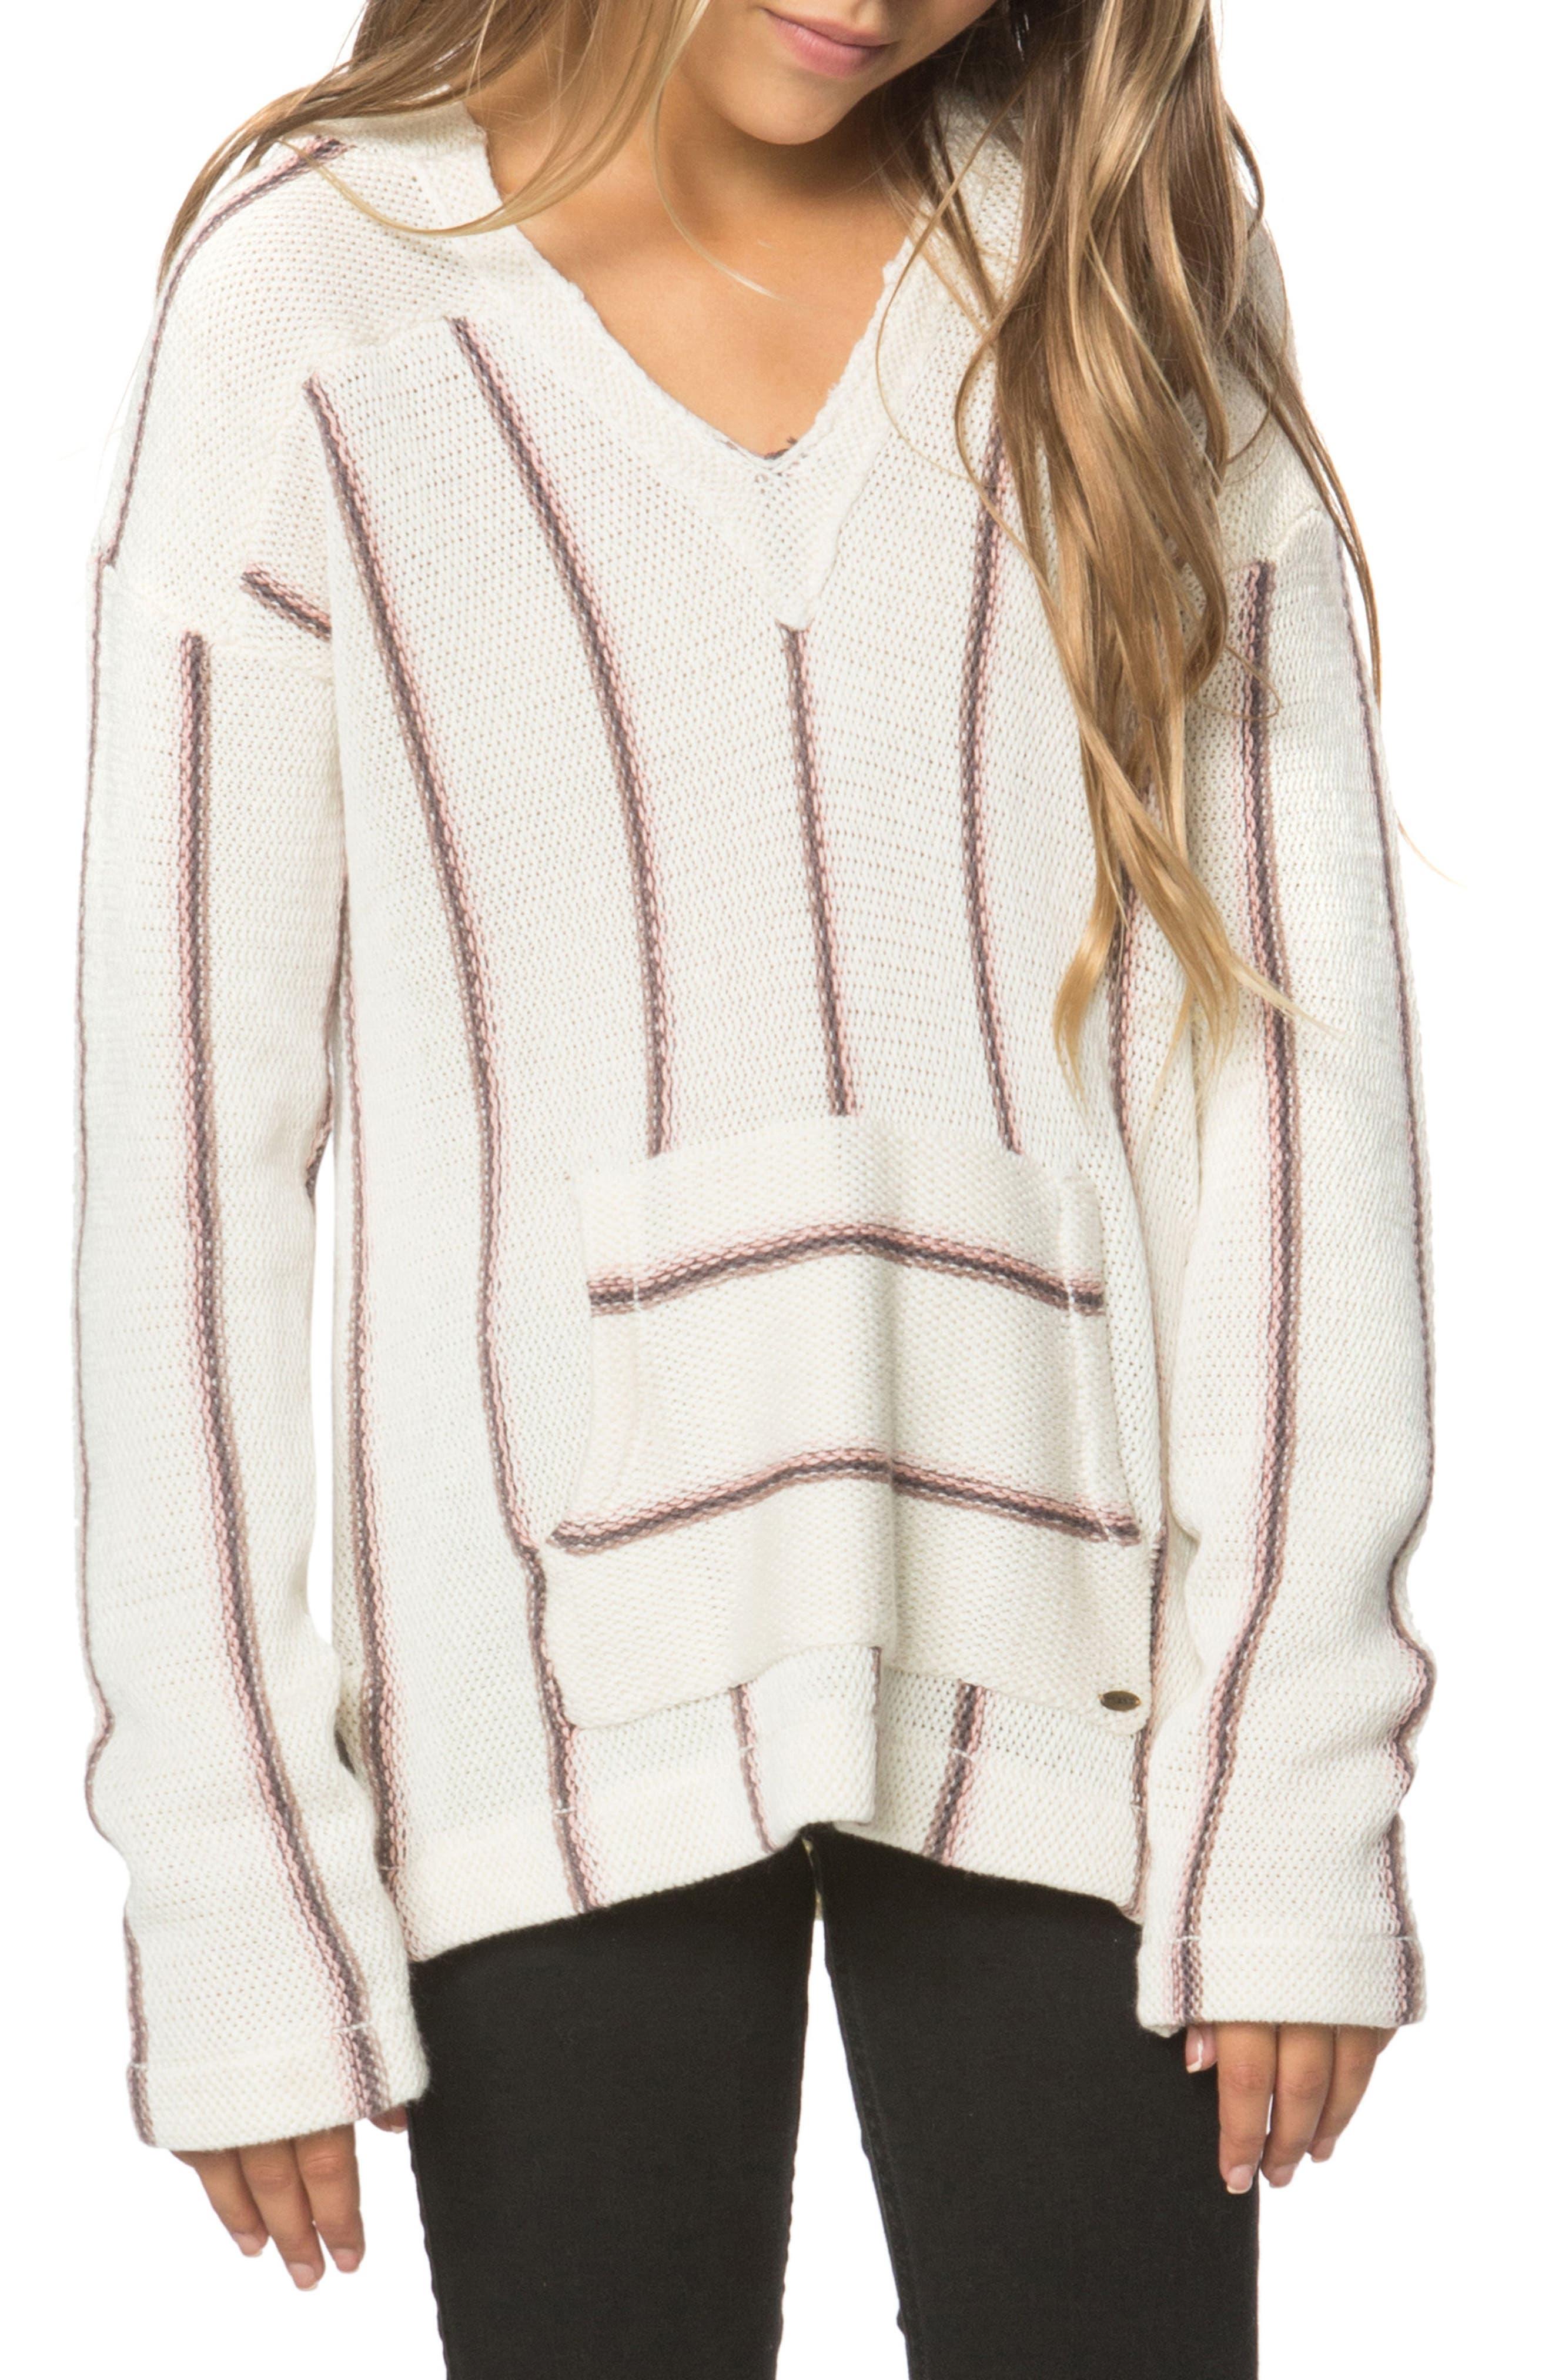 Ashlynn Hooded Sweater,                         Main,                         color, 900